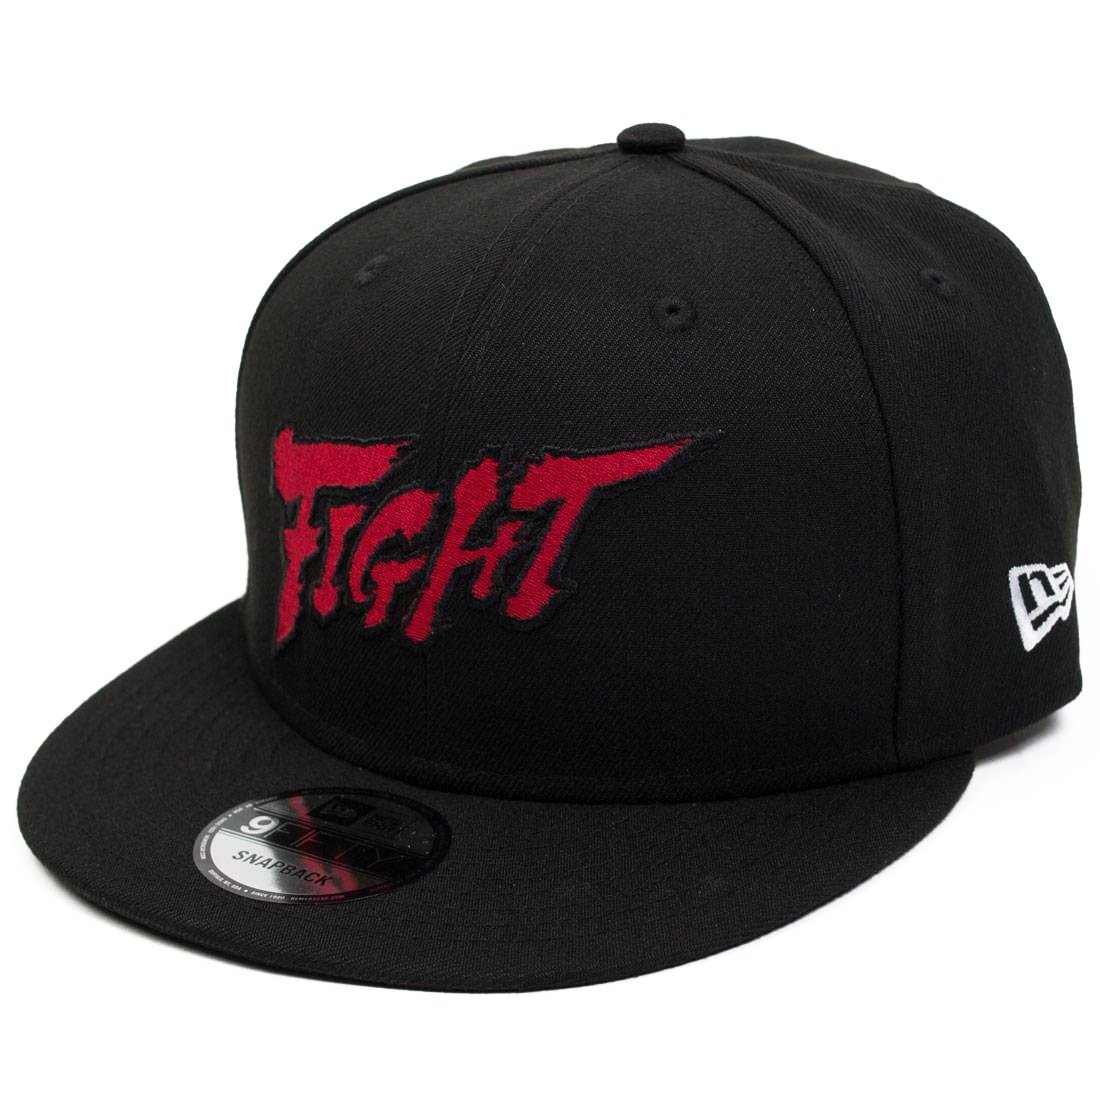 BAIT X Street Fighter X New Era Fight Snapback Cap Black